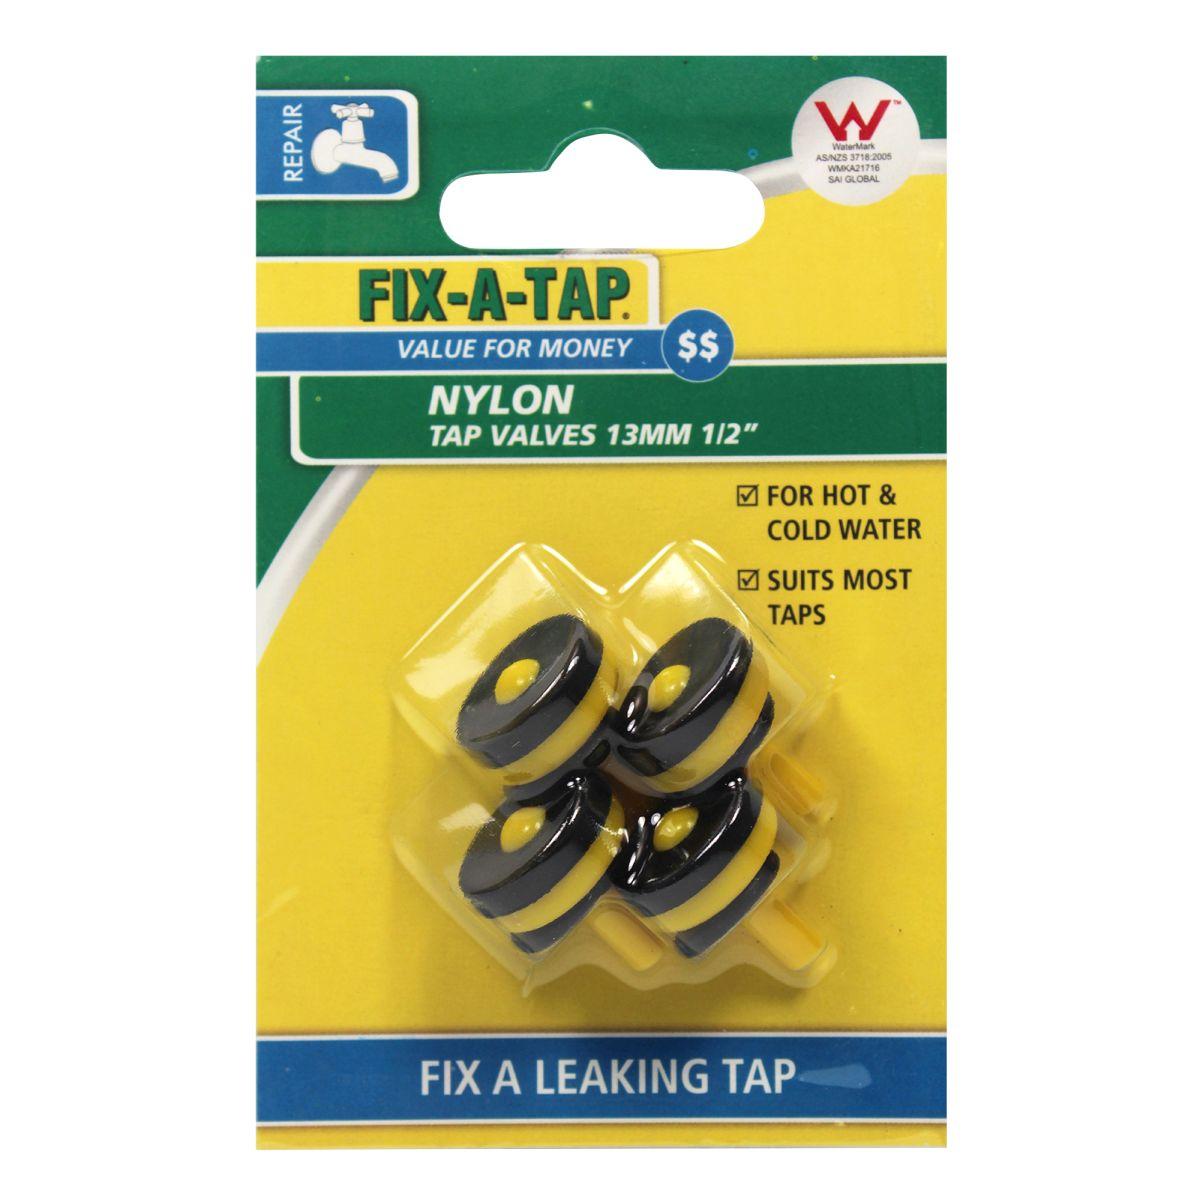 FIX-A-TAP Nylon Tap Valves 13mm